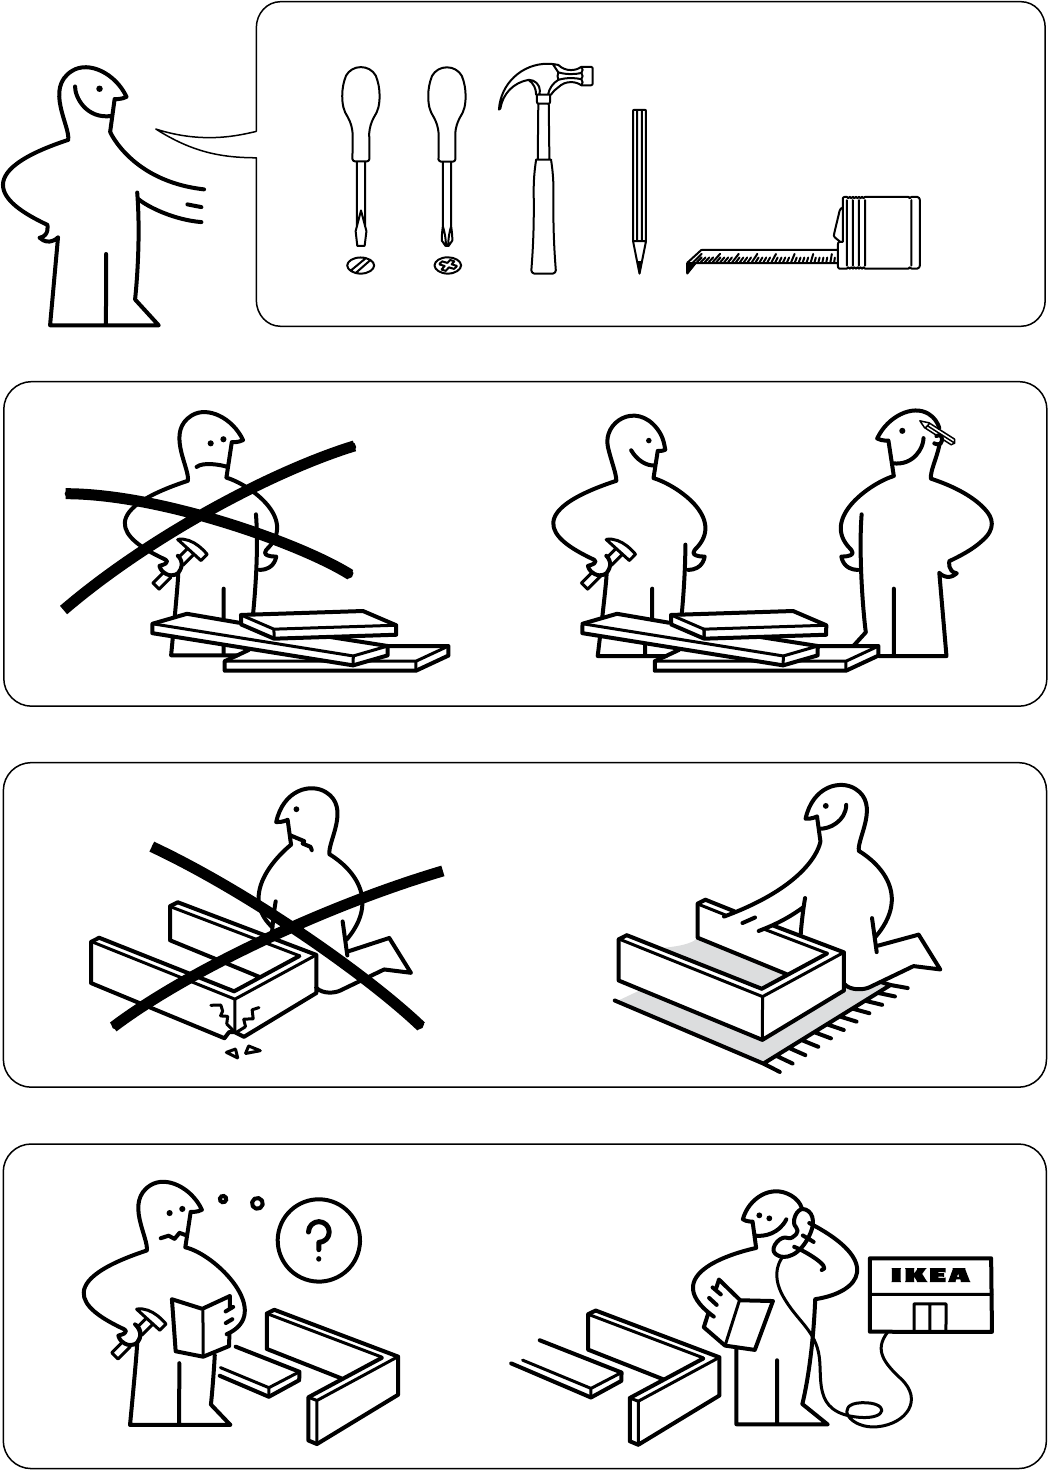 Hemnes Ladekast 3 Laden.Handleiding Ikea Hemnes Ladekast 3 Lades Pagina 2 Van 20